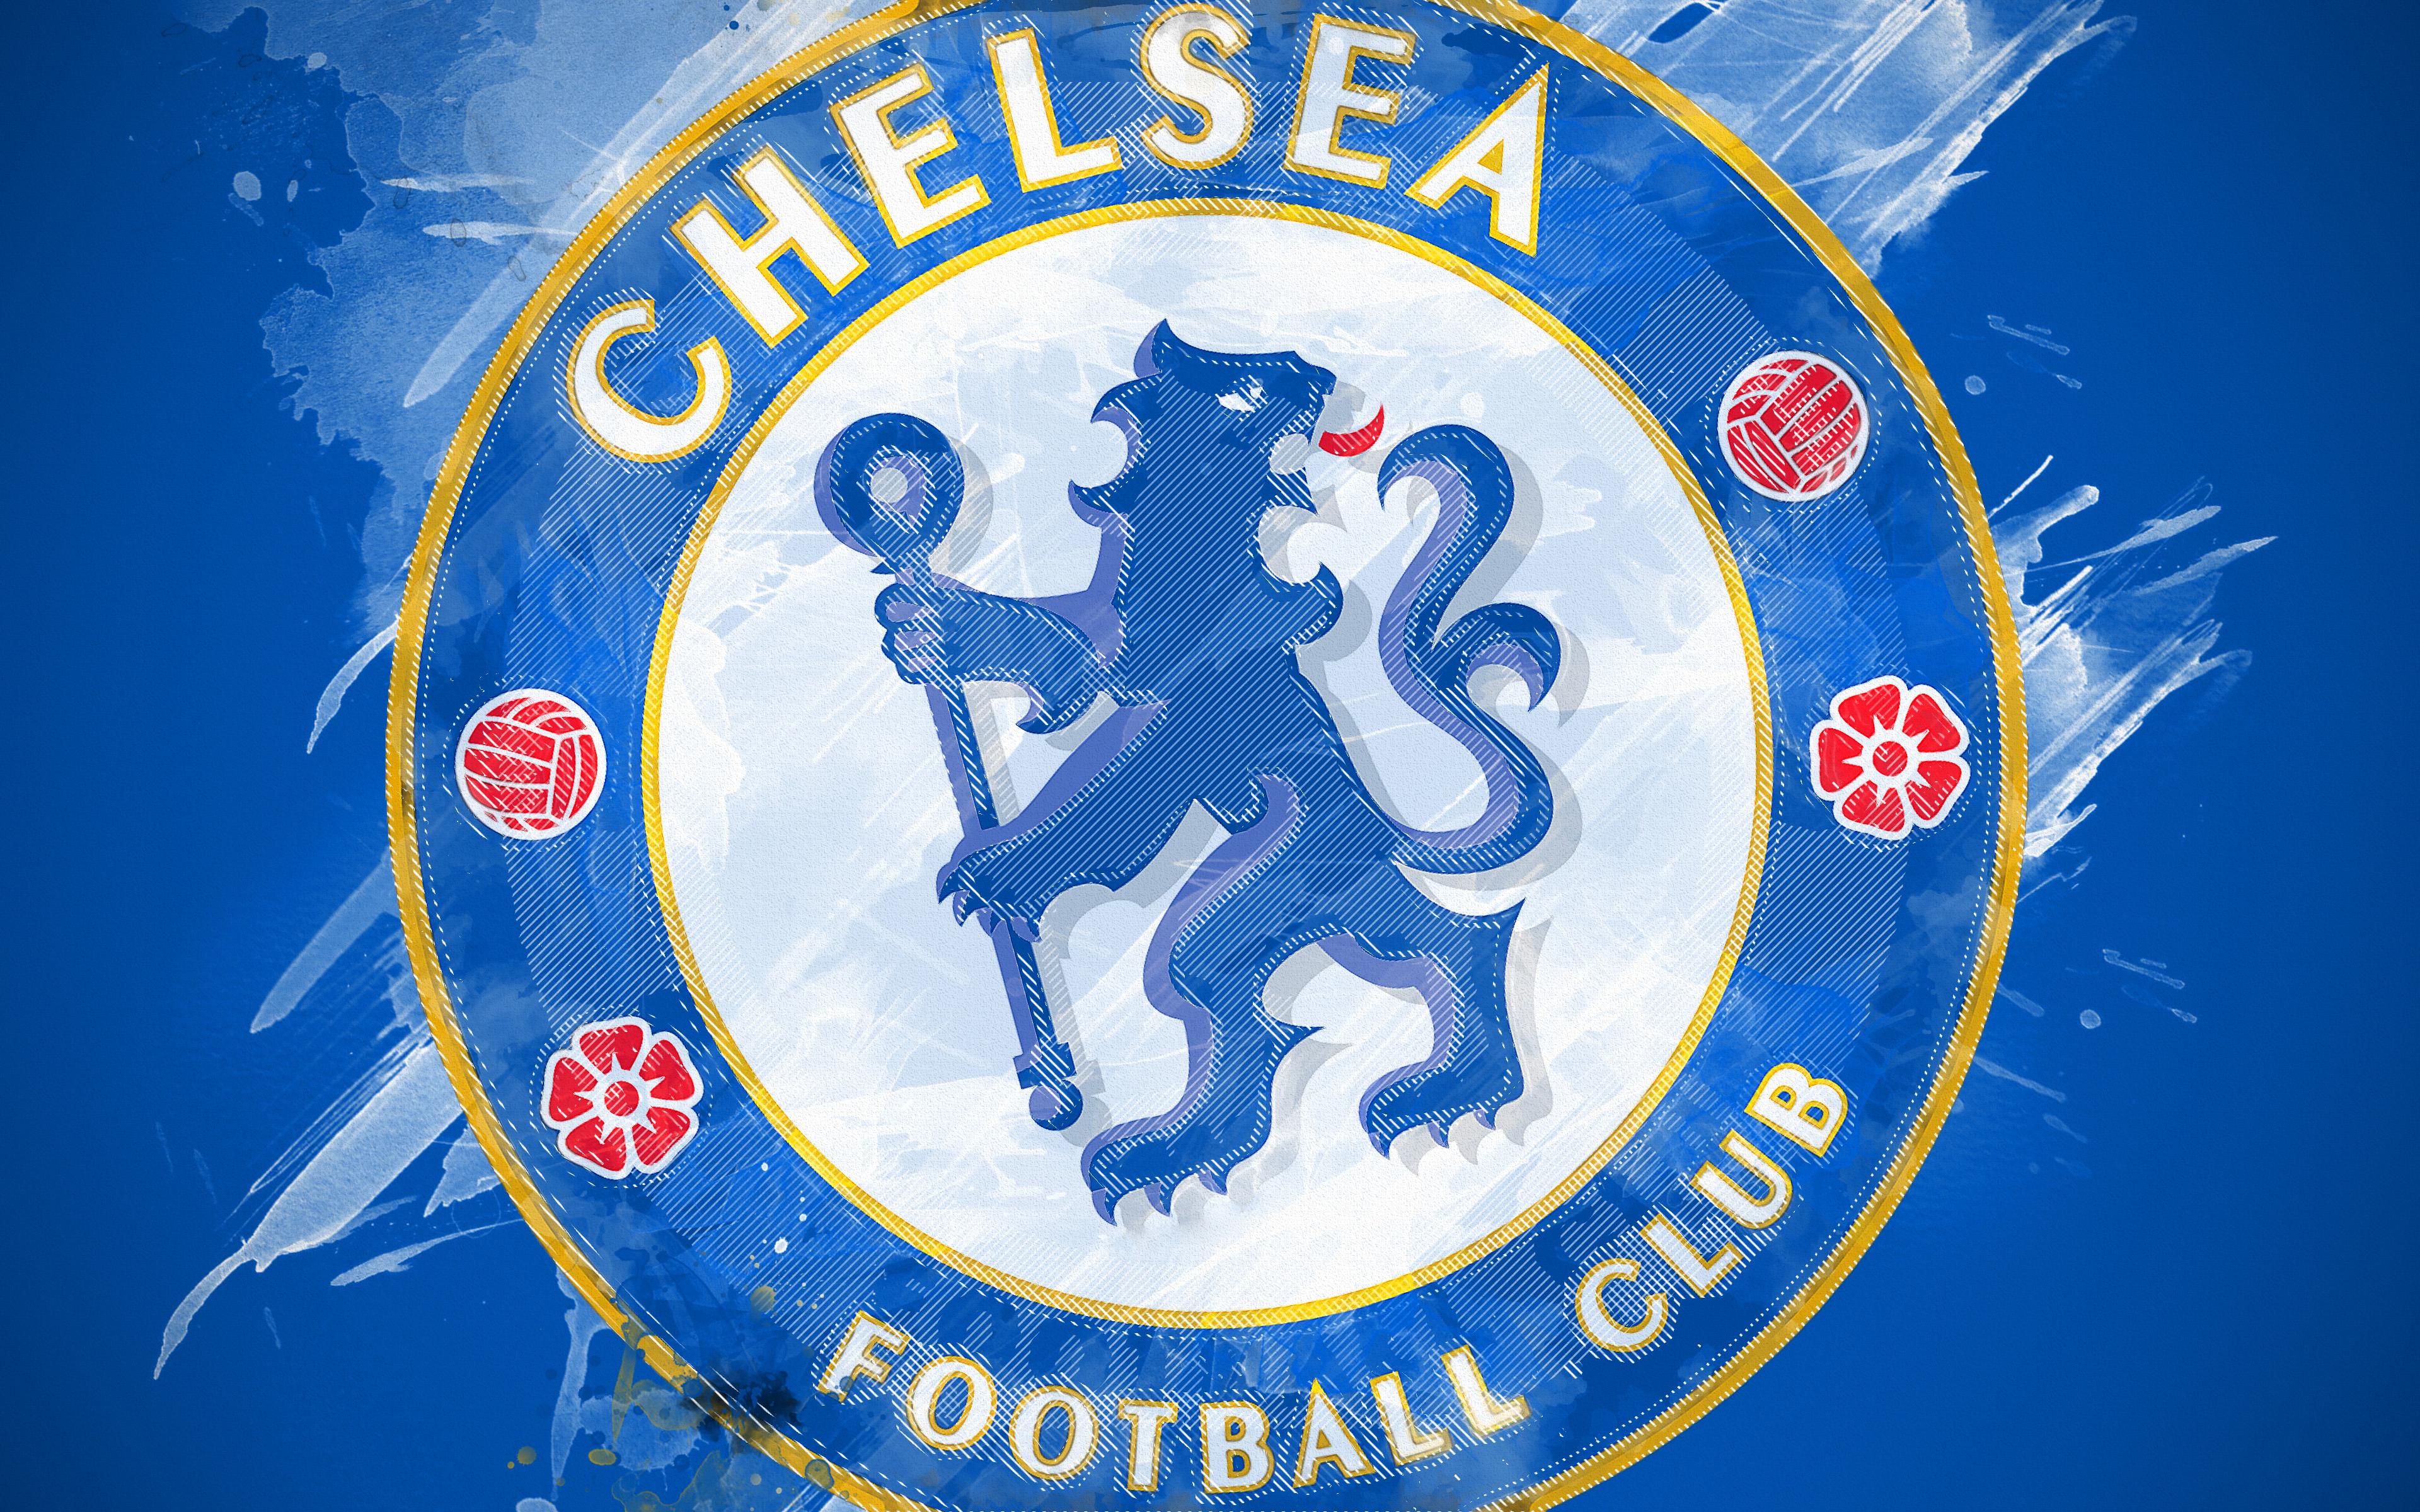 Chelsea Logo 4k Ultra Hd Wallpaper Background Image